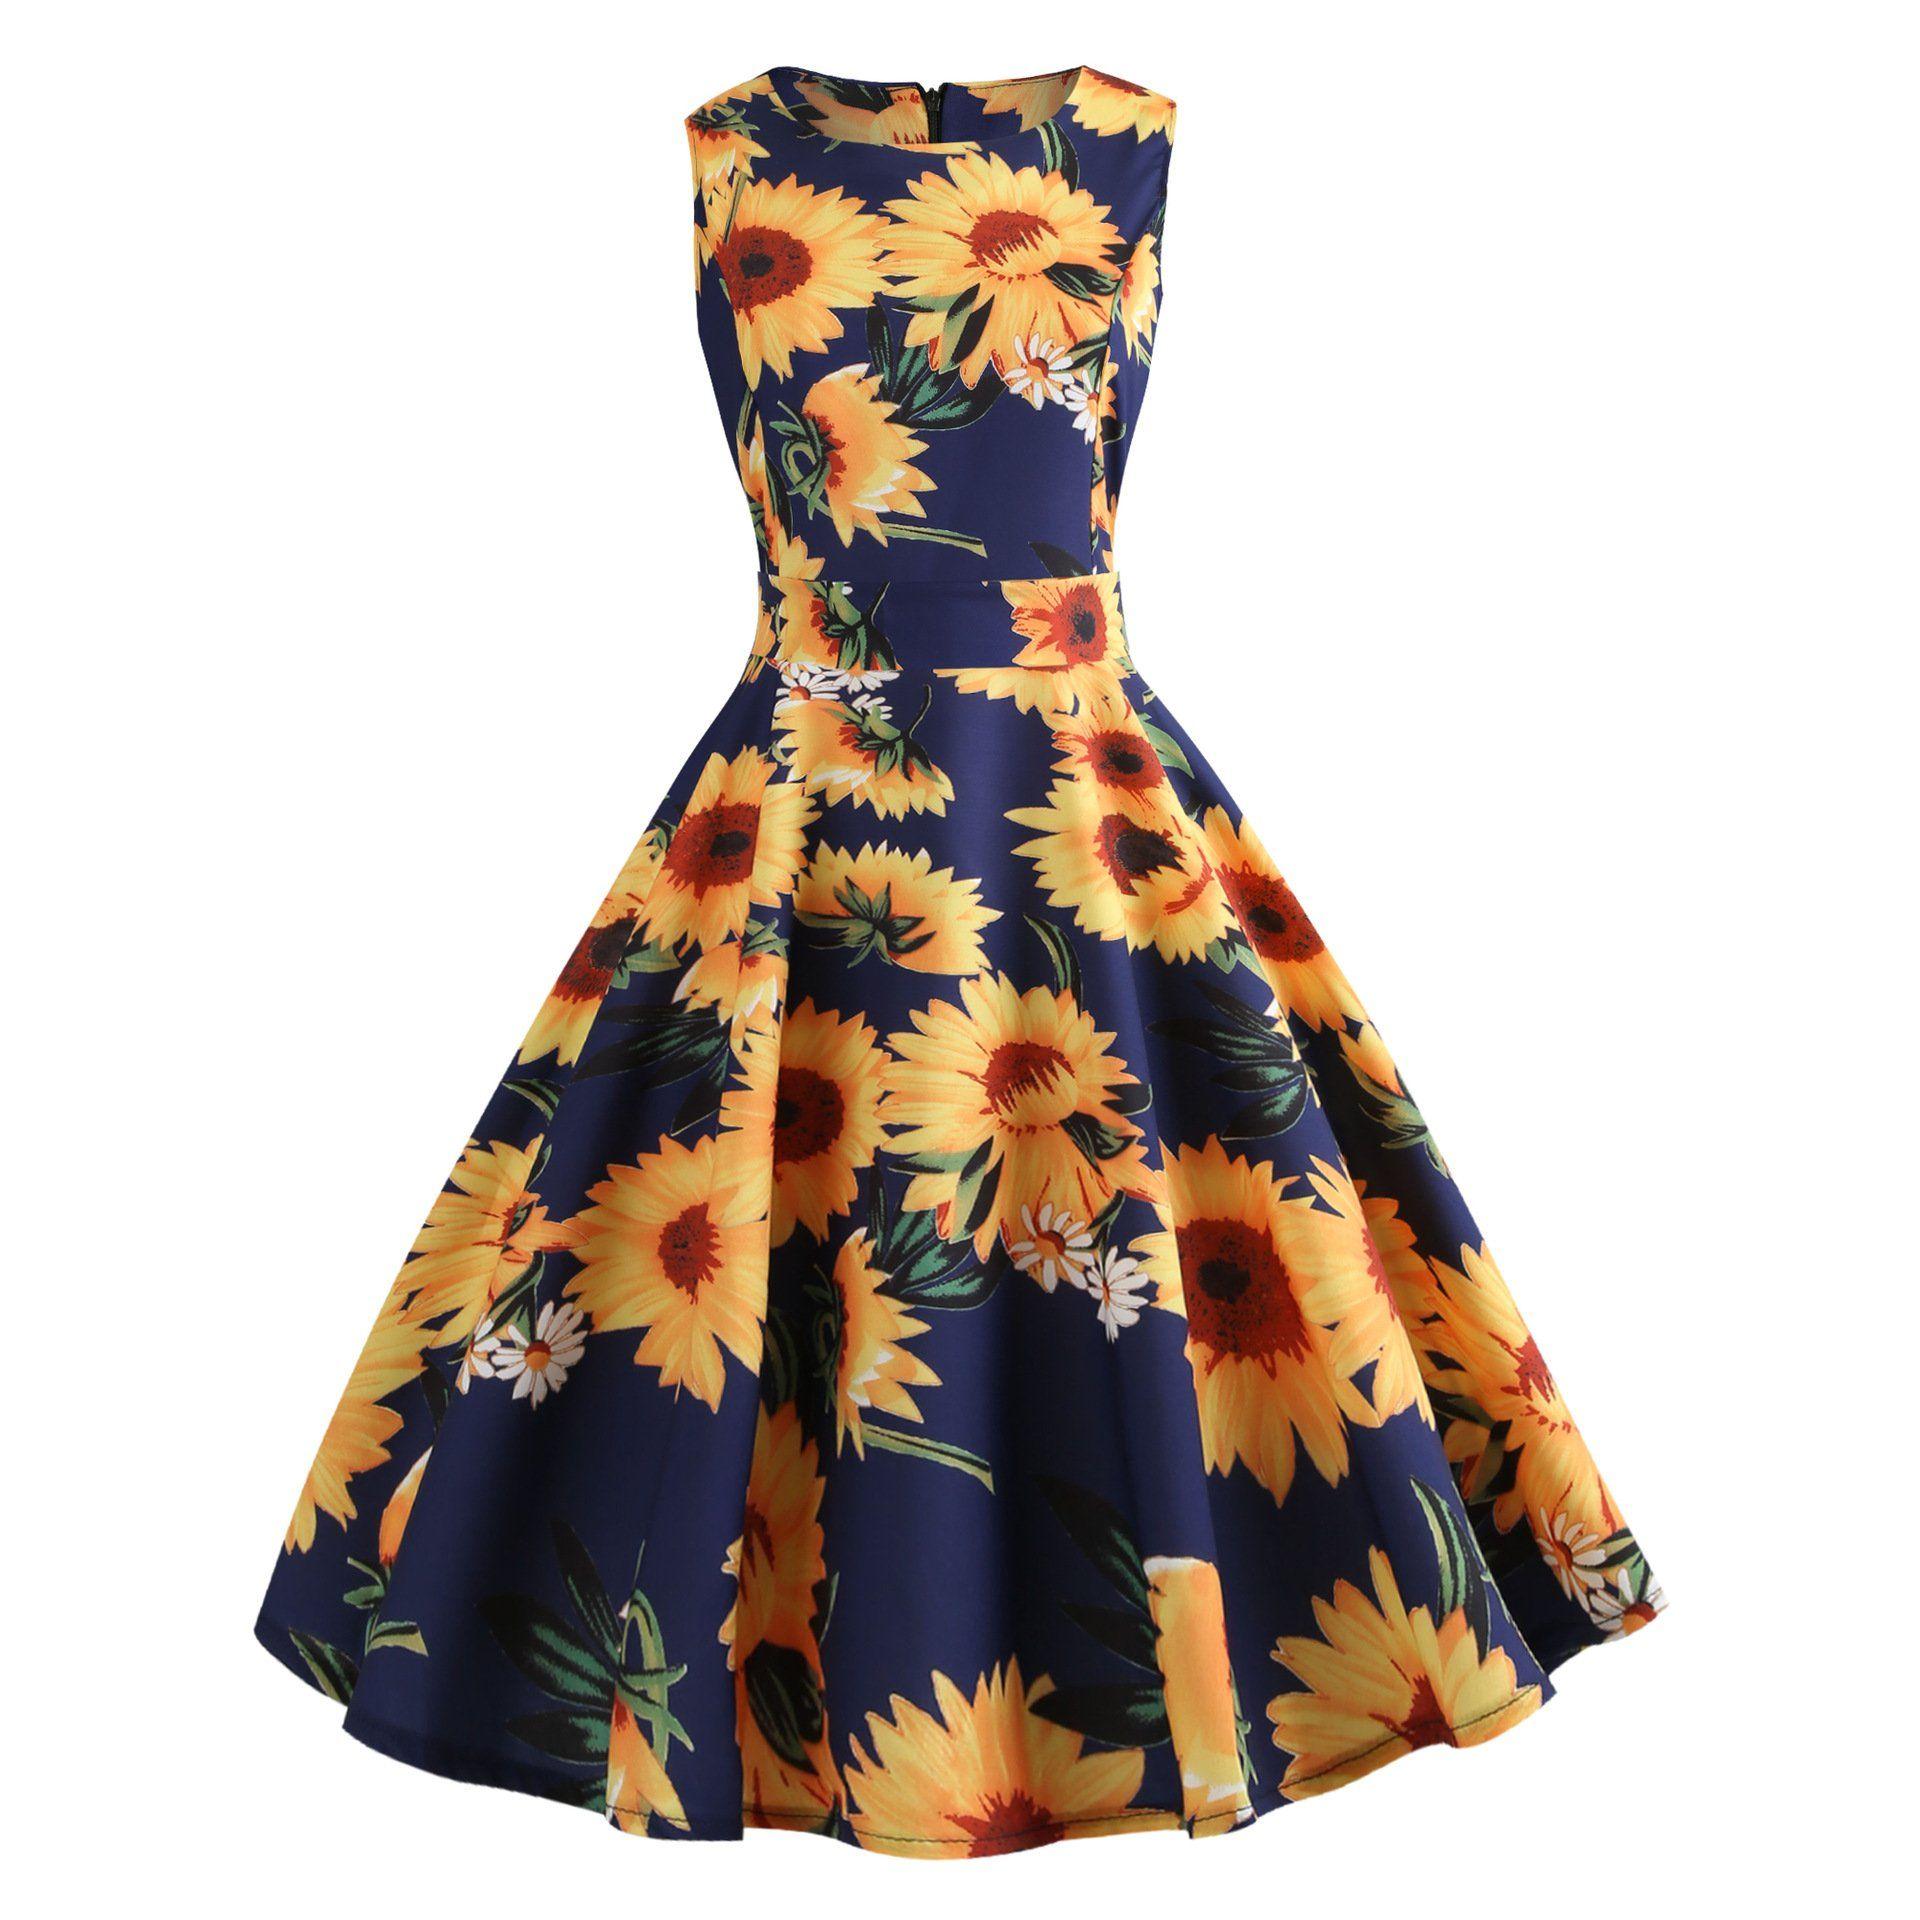 Women S 1950s Retro Vintage Cocktail Party Sun Flower Print Swing Dress Flower Print Dress Summer Printed Summer Dresses Plus Size Vintage Dresses [ 1920 x 1920 Pixel ]